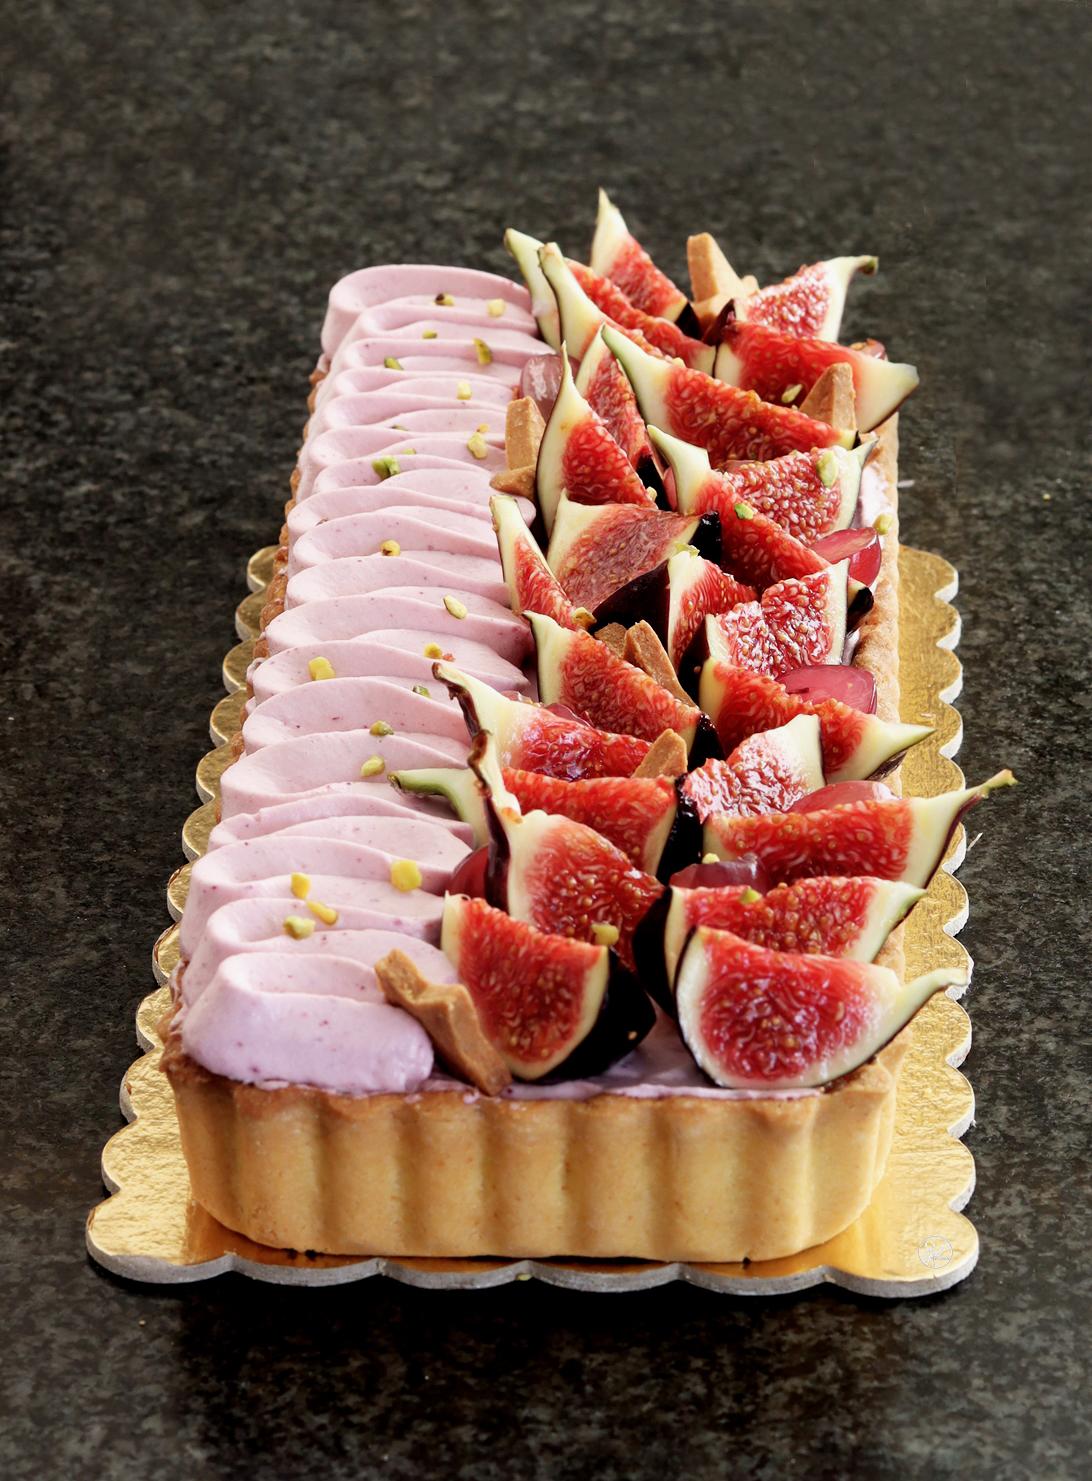 Crostata frangipane con fichi e uva senza glutine - La Cassata Celiaca